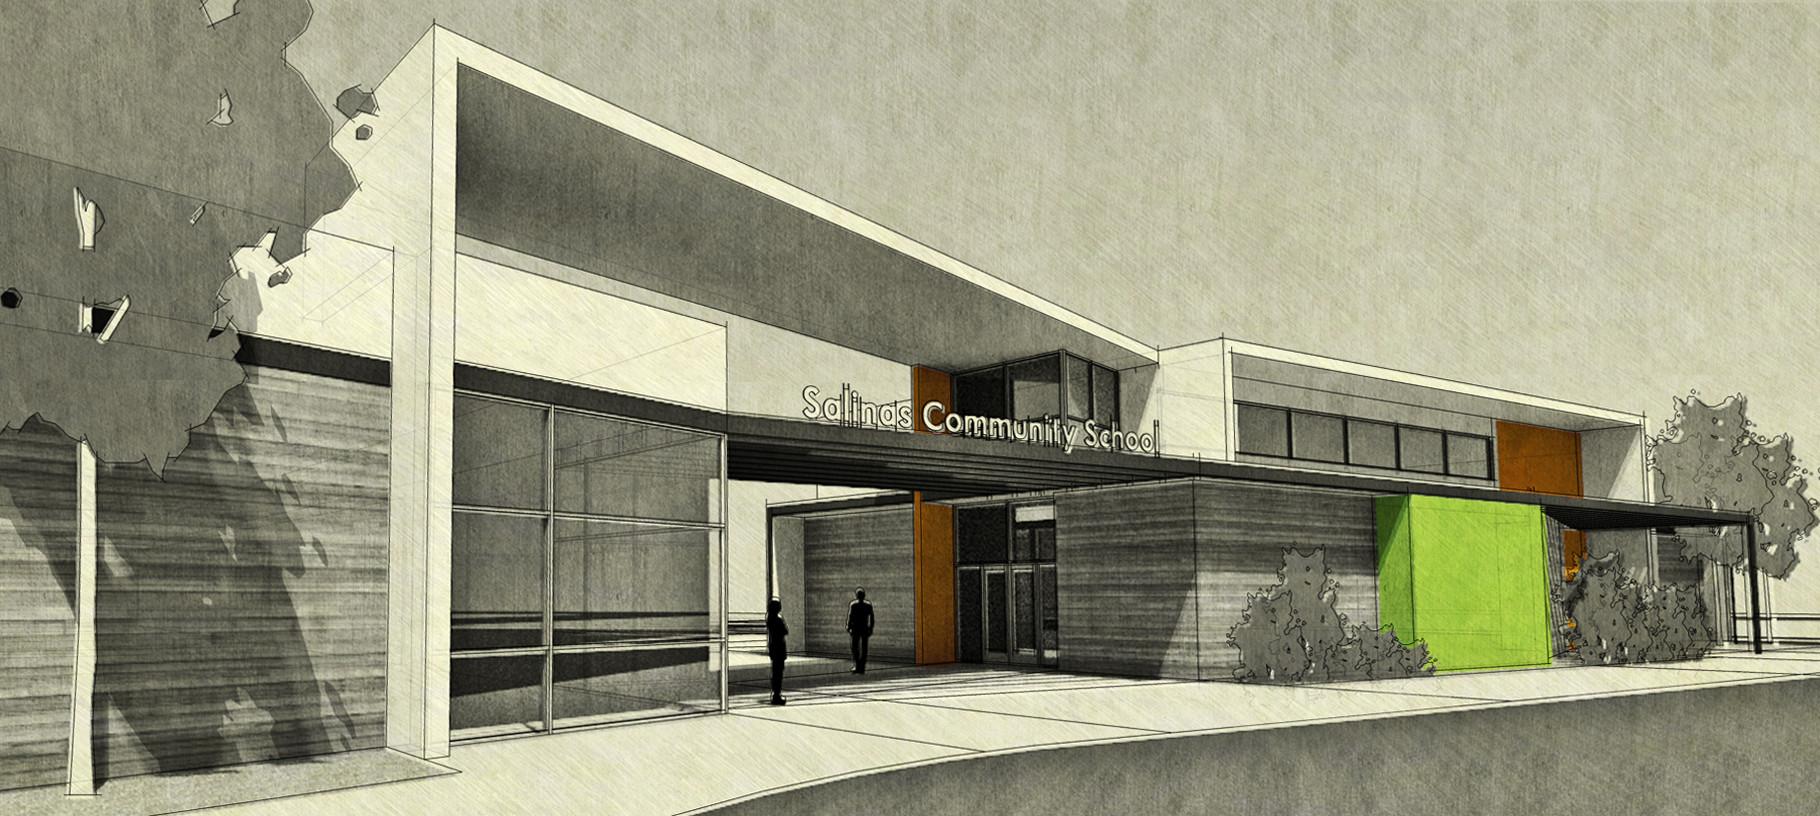 Salinas Community School